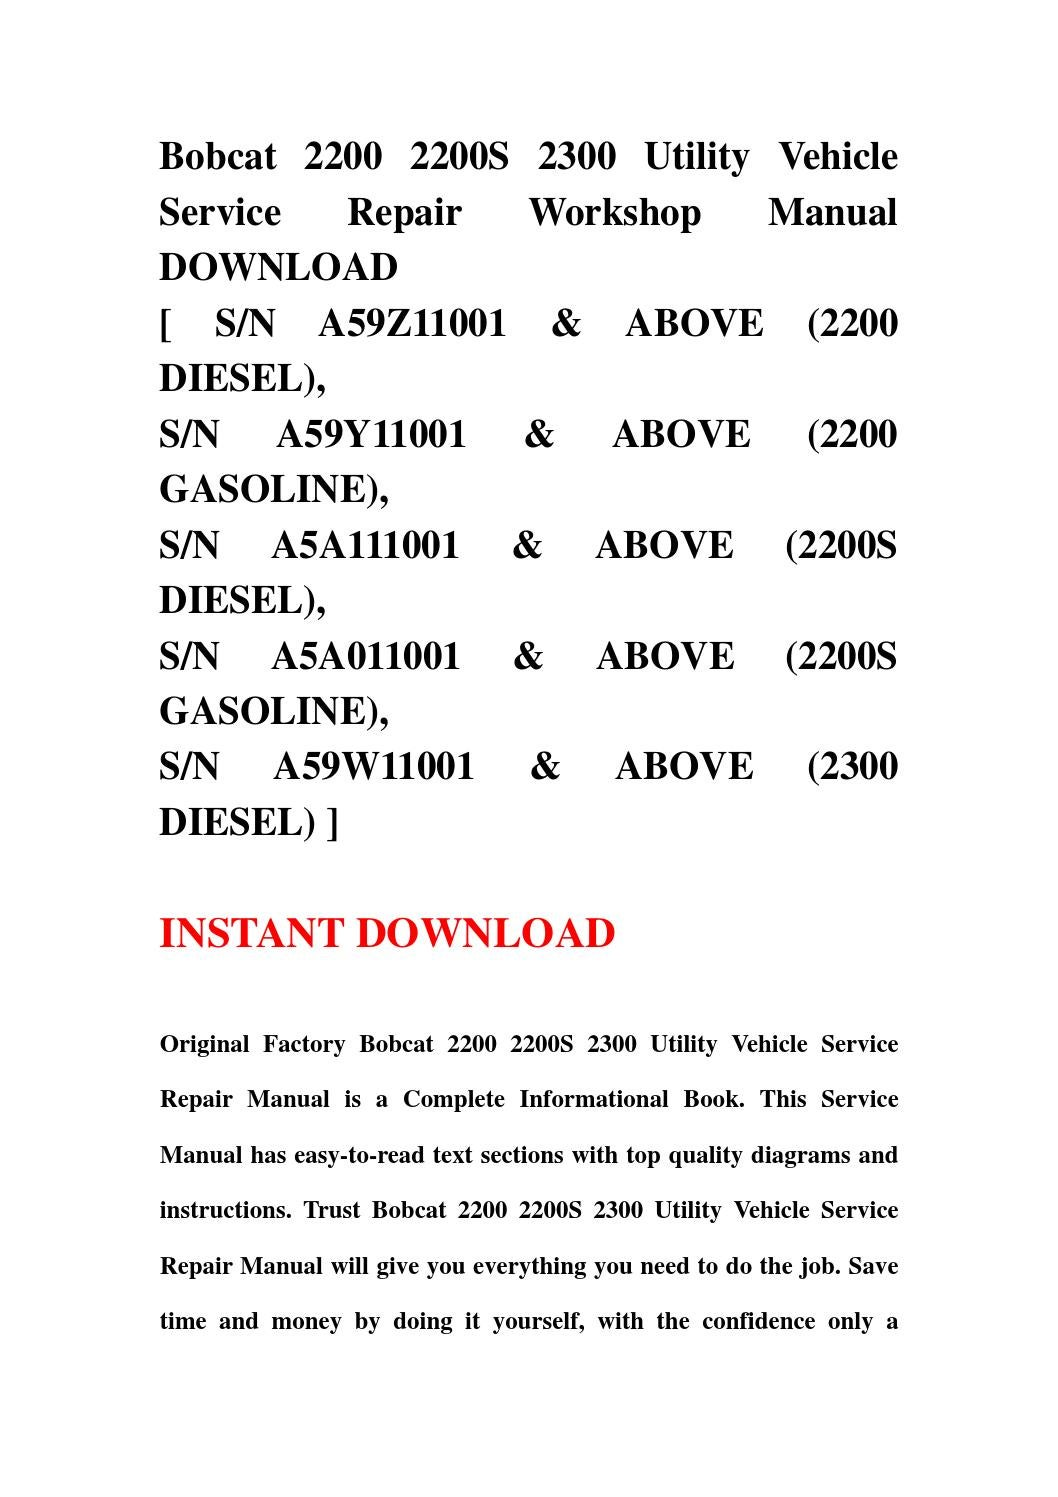 Bobcat 2200 2200s 2300 utility vehicle service repair workshop bobcat 2200 2200s 2300 utility vehicle service repair workshop manual download by kksjfnnse mkfjsemf issuu solutioingenieria Choice Image